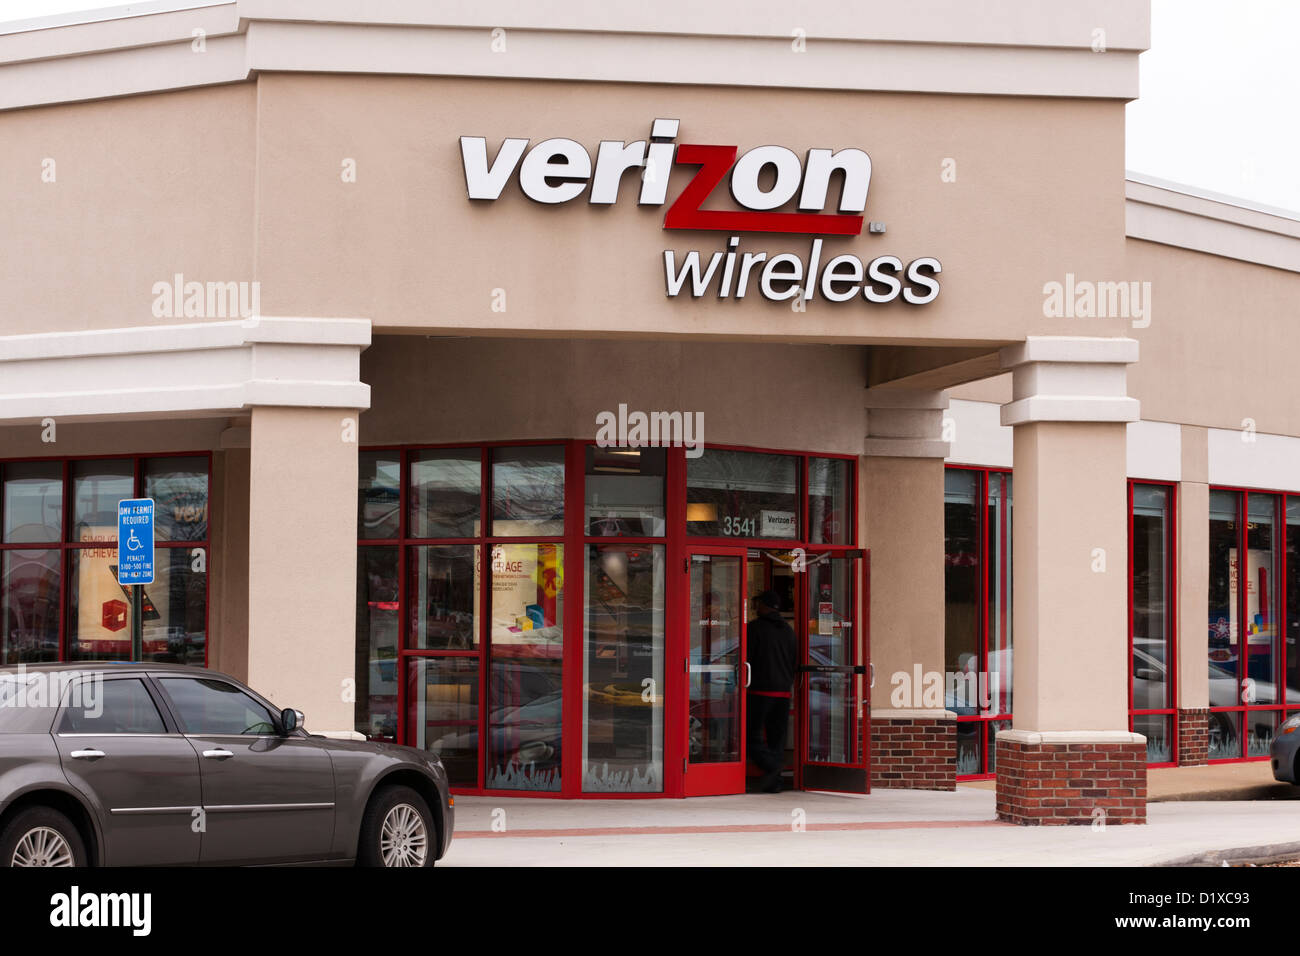 Verizon Wireless retail store Immagini Stock